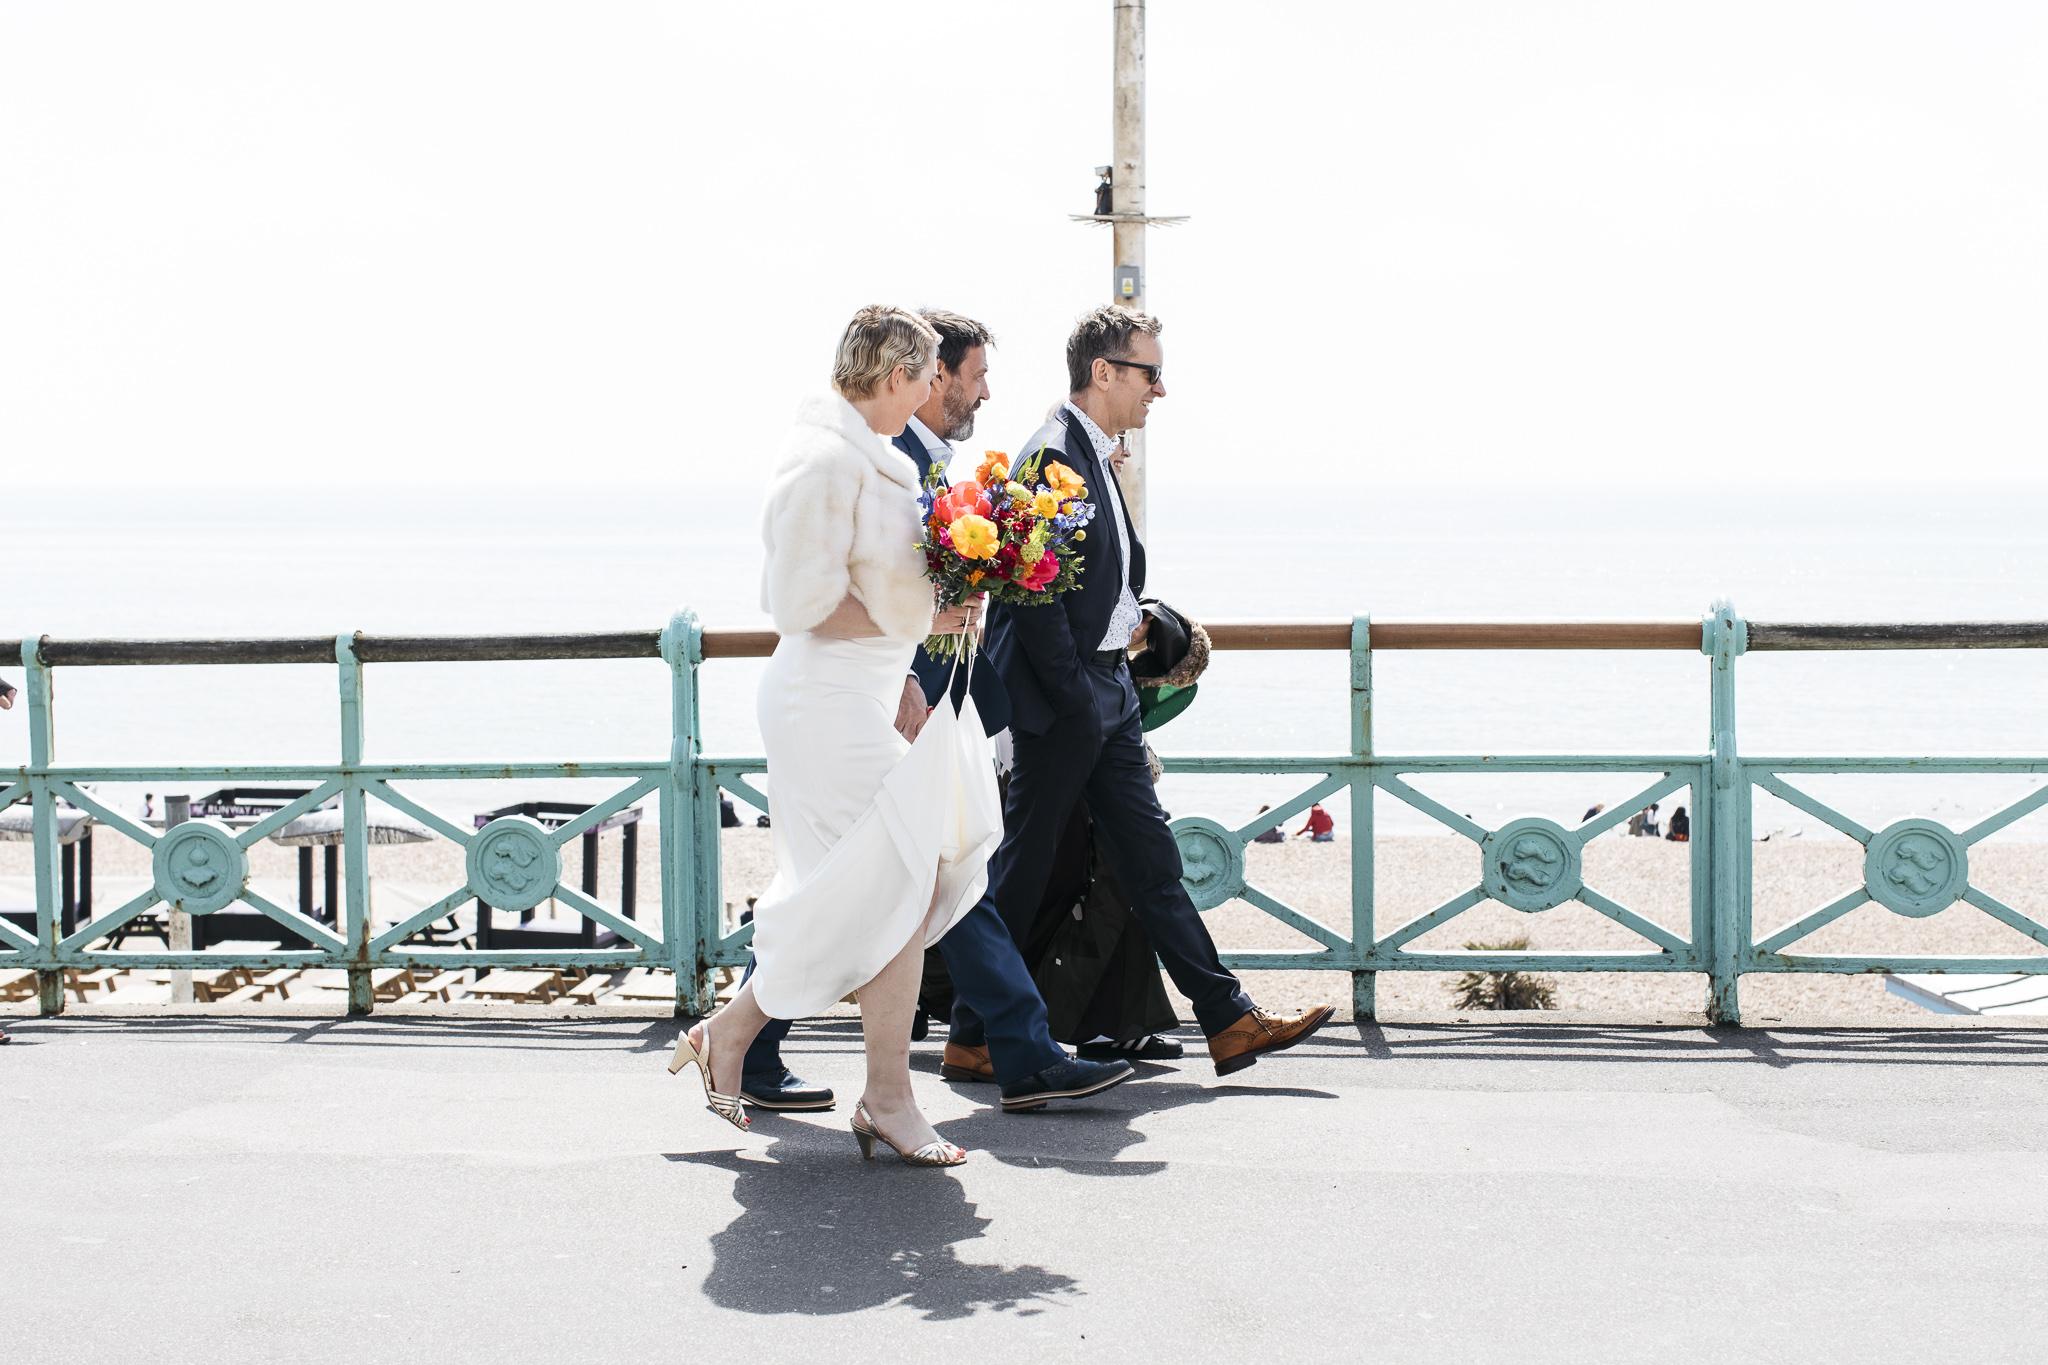 short_coverage_wedding_photographer_brighton_024.jpg